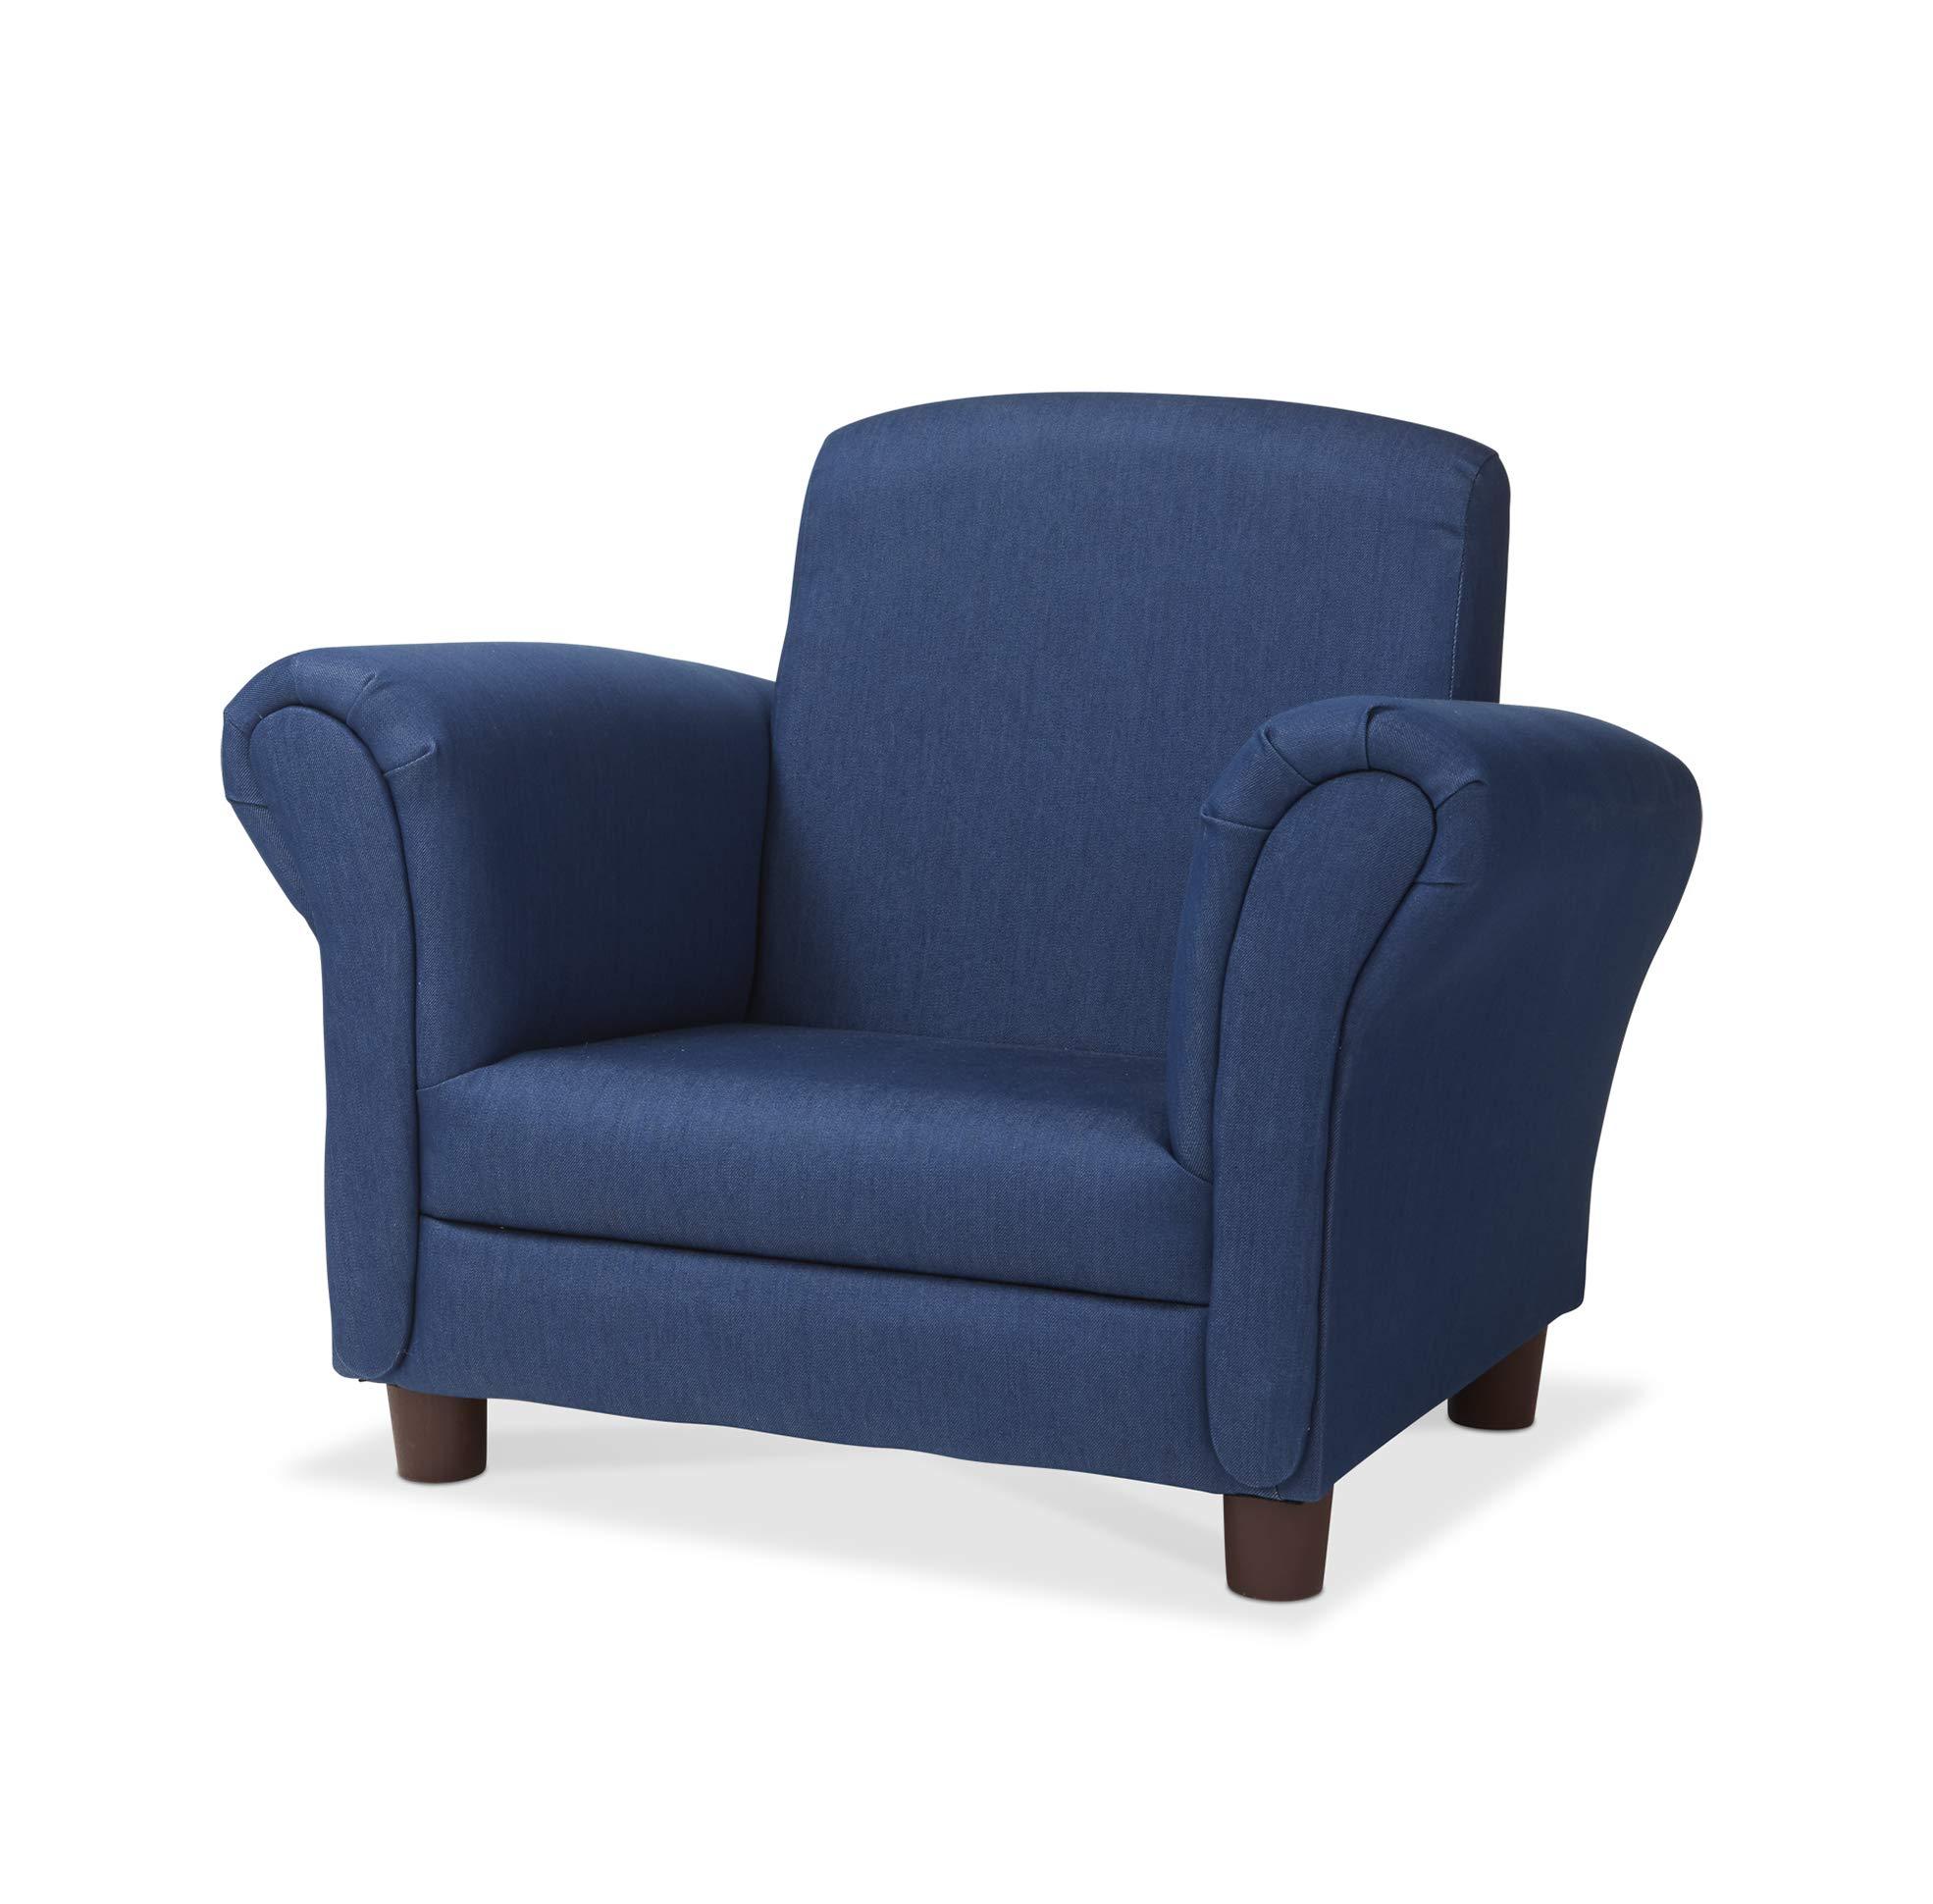 Melissa & Doug Child's Armchair - Denim Children's Furniture - Amazon Exclusive